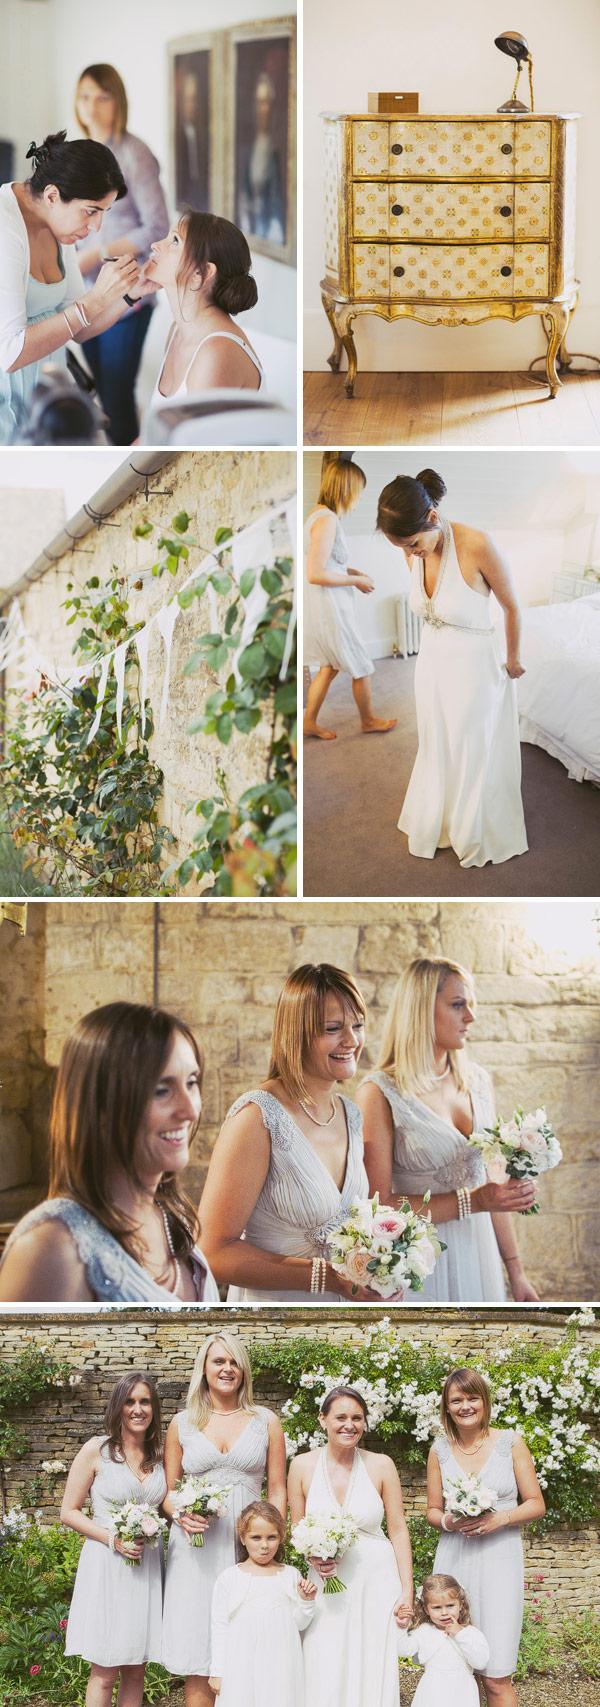 Sadaf mirhosseini wedding